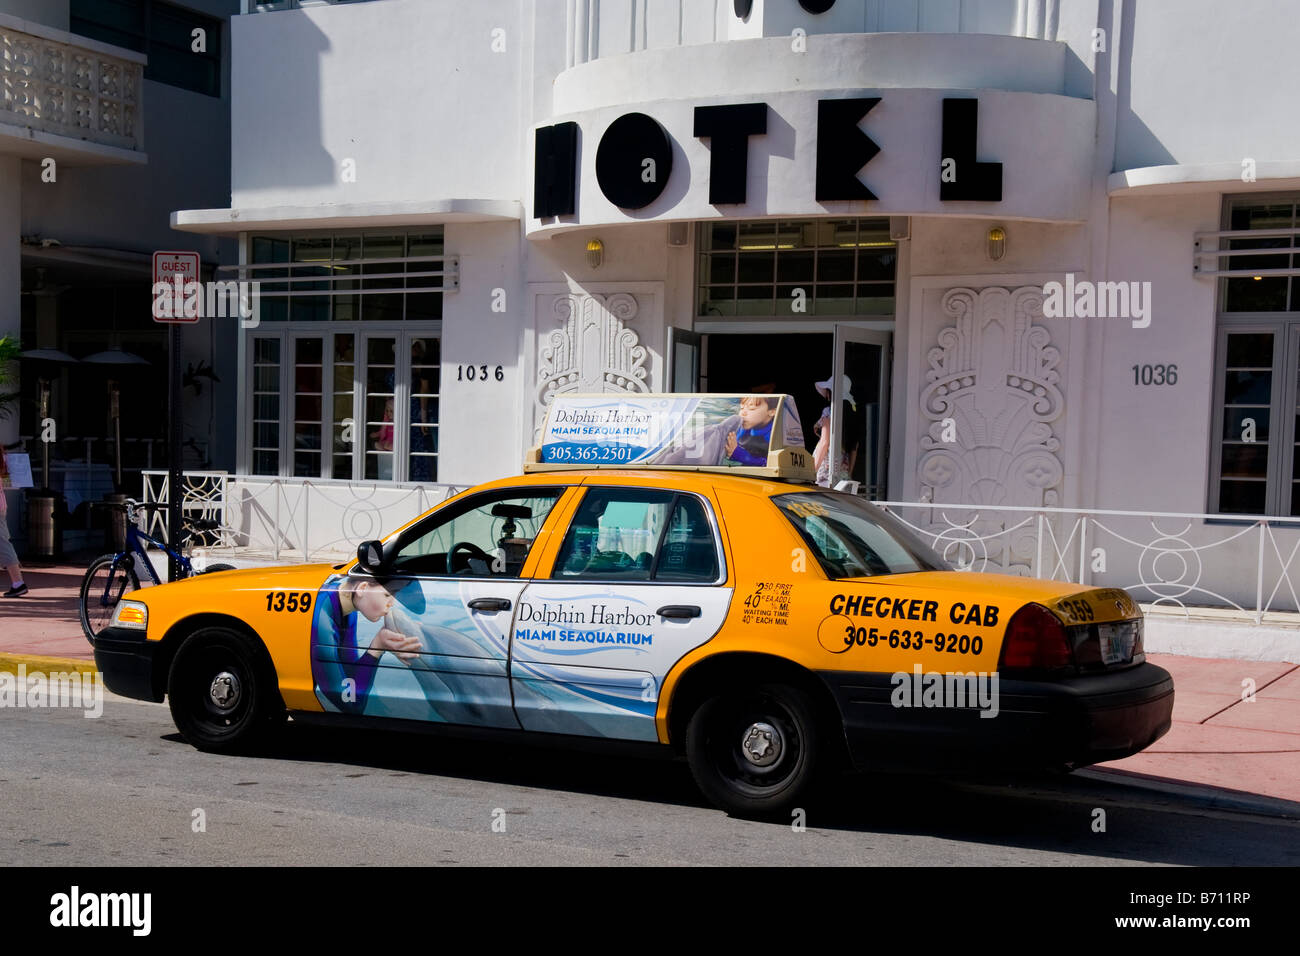 Miami South Beach Ocean Drive Checker Yellow Taxi Cab Car With Adverts Awaits Fare Outside Art Deco Hotel Congress Entrance